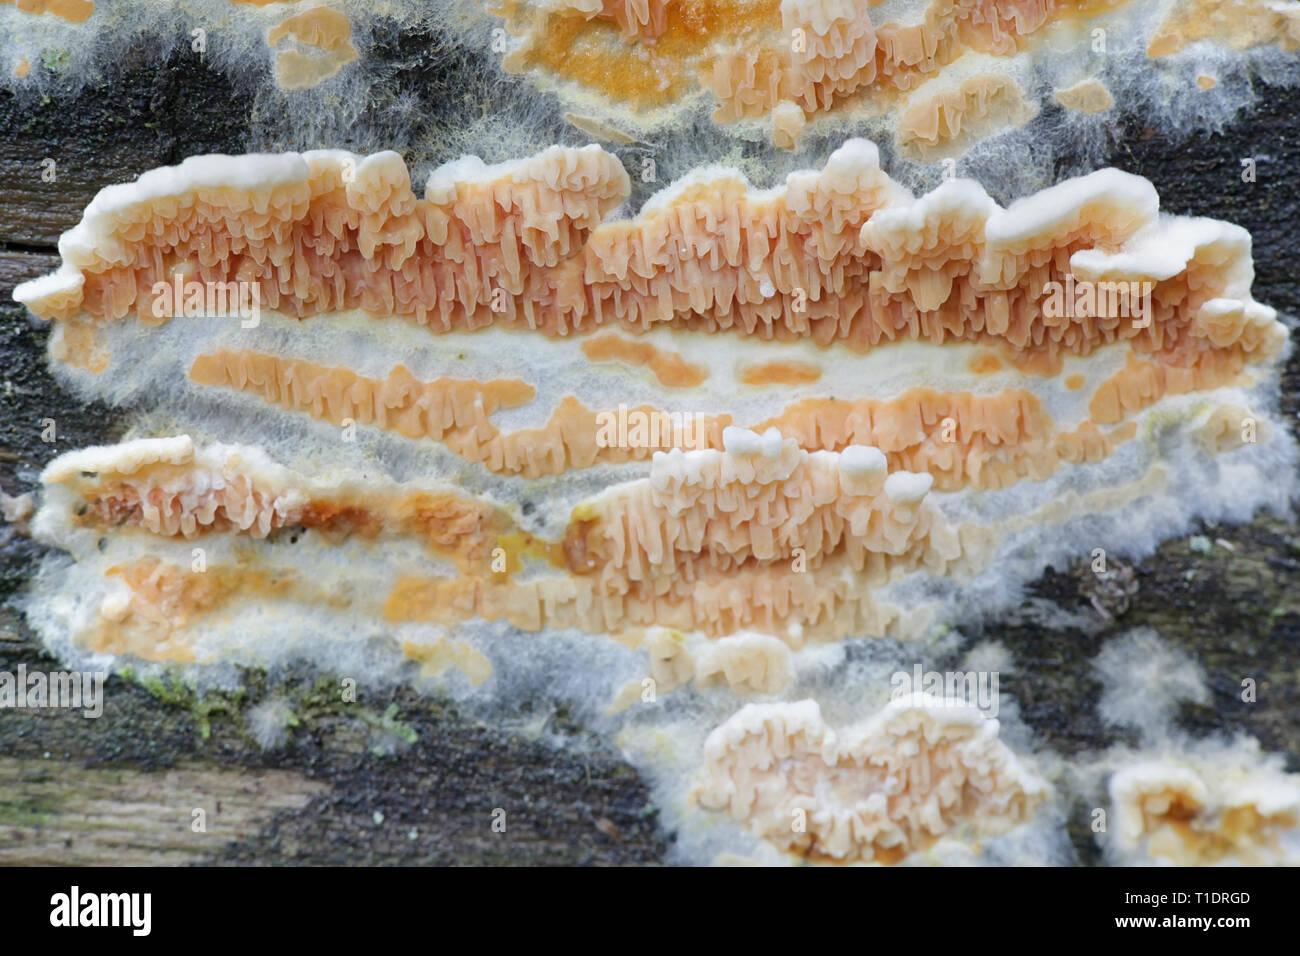 Warped orange crust fungus, Leucogyrophana mollusca Stock Photo